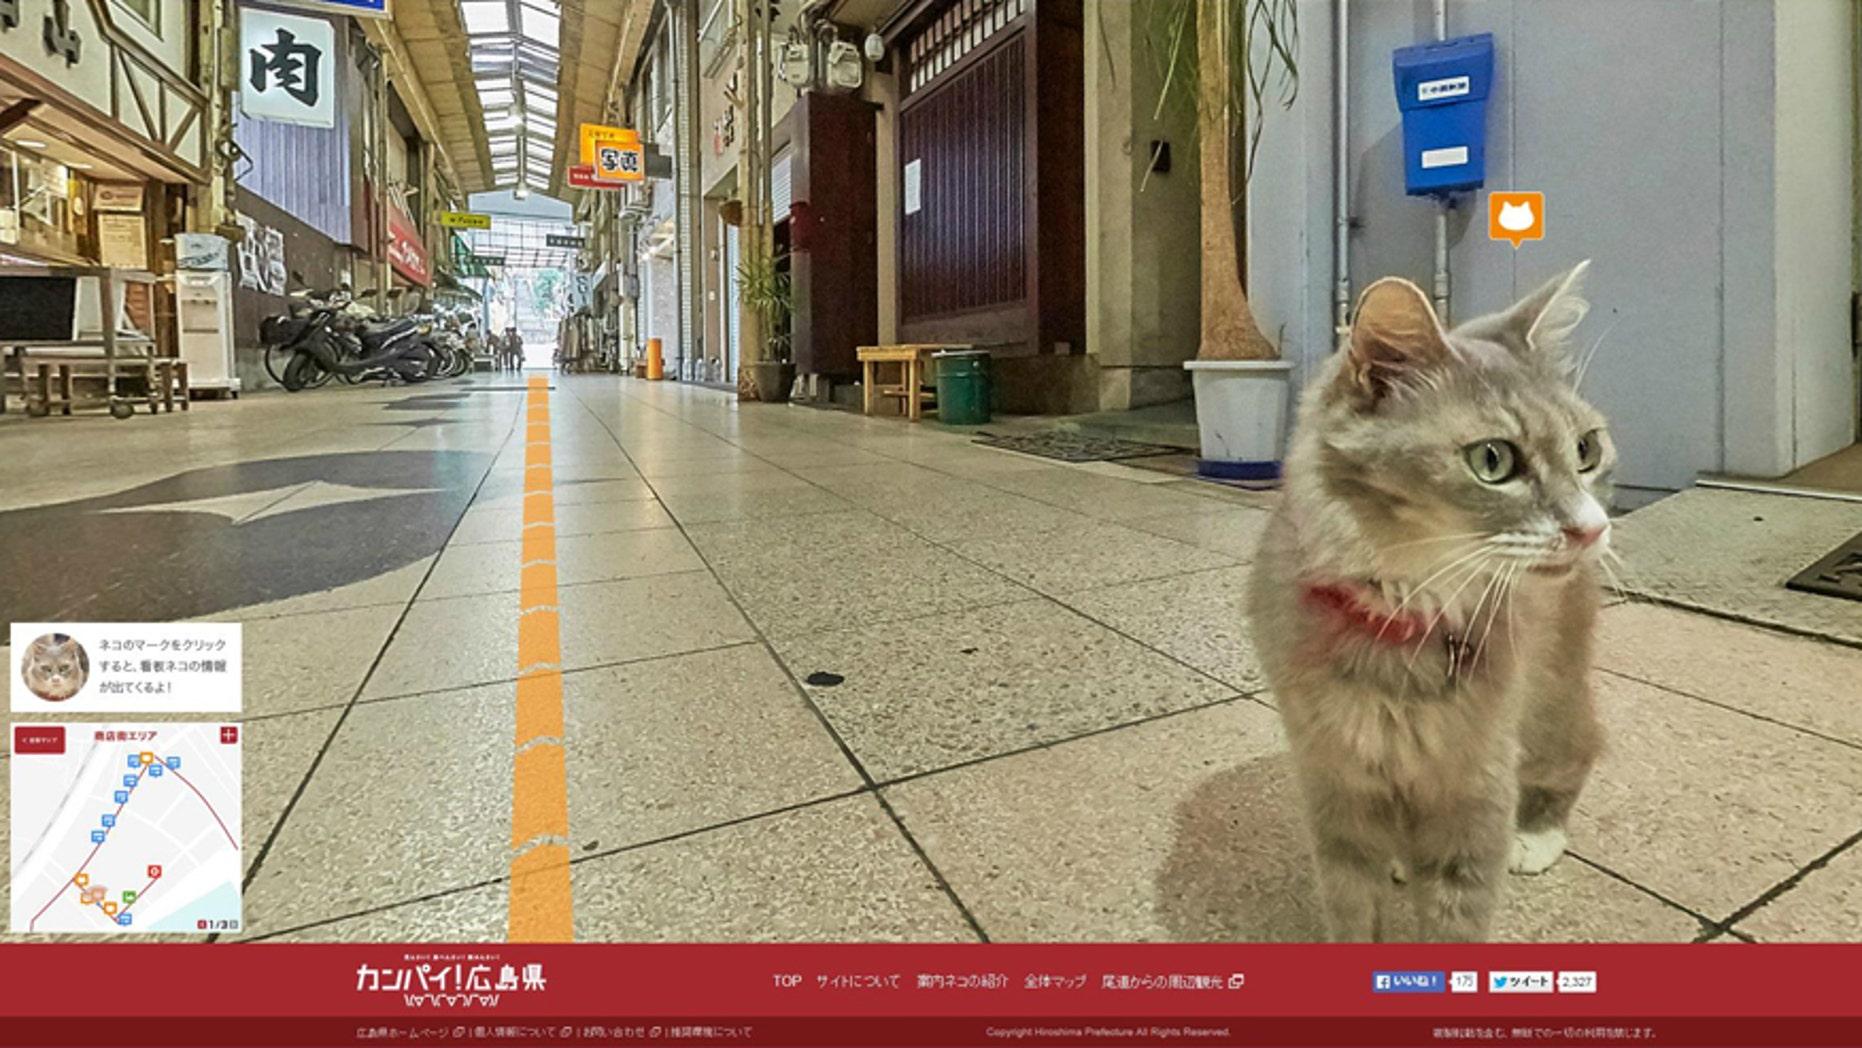 Screenshot of http://hiroshima-welcome.jp/kanpai/catstreetview